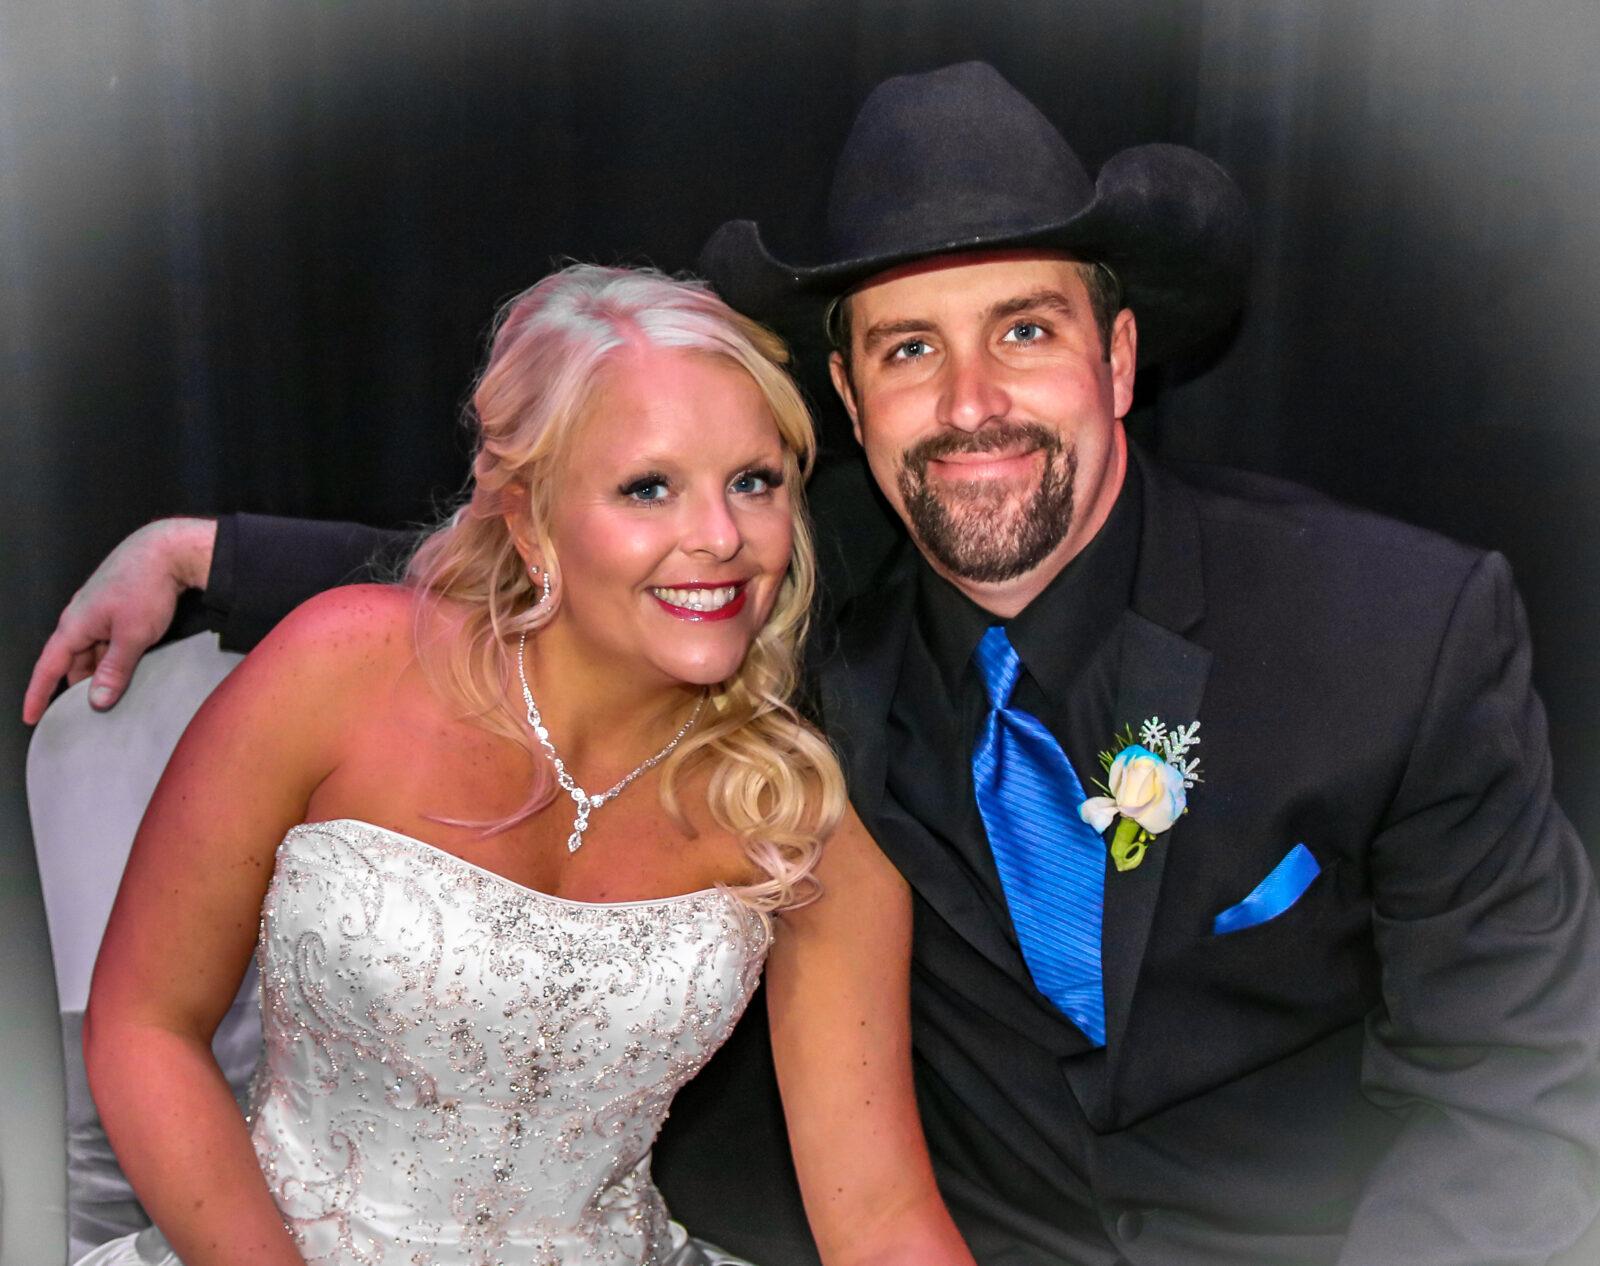 Bride, Groom, Wedding Dress, Tuxedo, Rustin Wedding, Happy Couple, Wedding DJ Service, Ceremony, Reception, Gering, Scottsbluff, NE, Wedding Venue